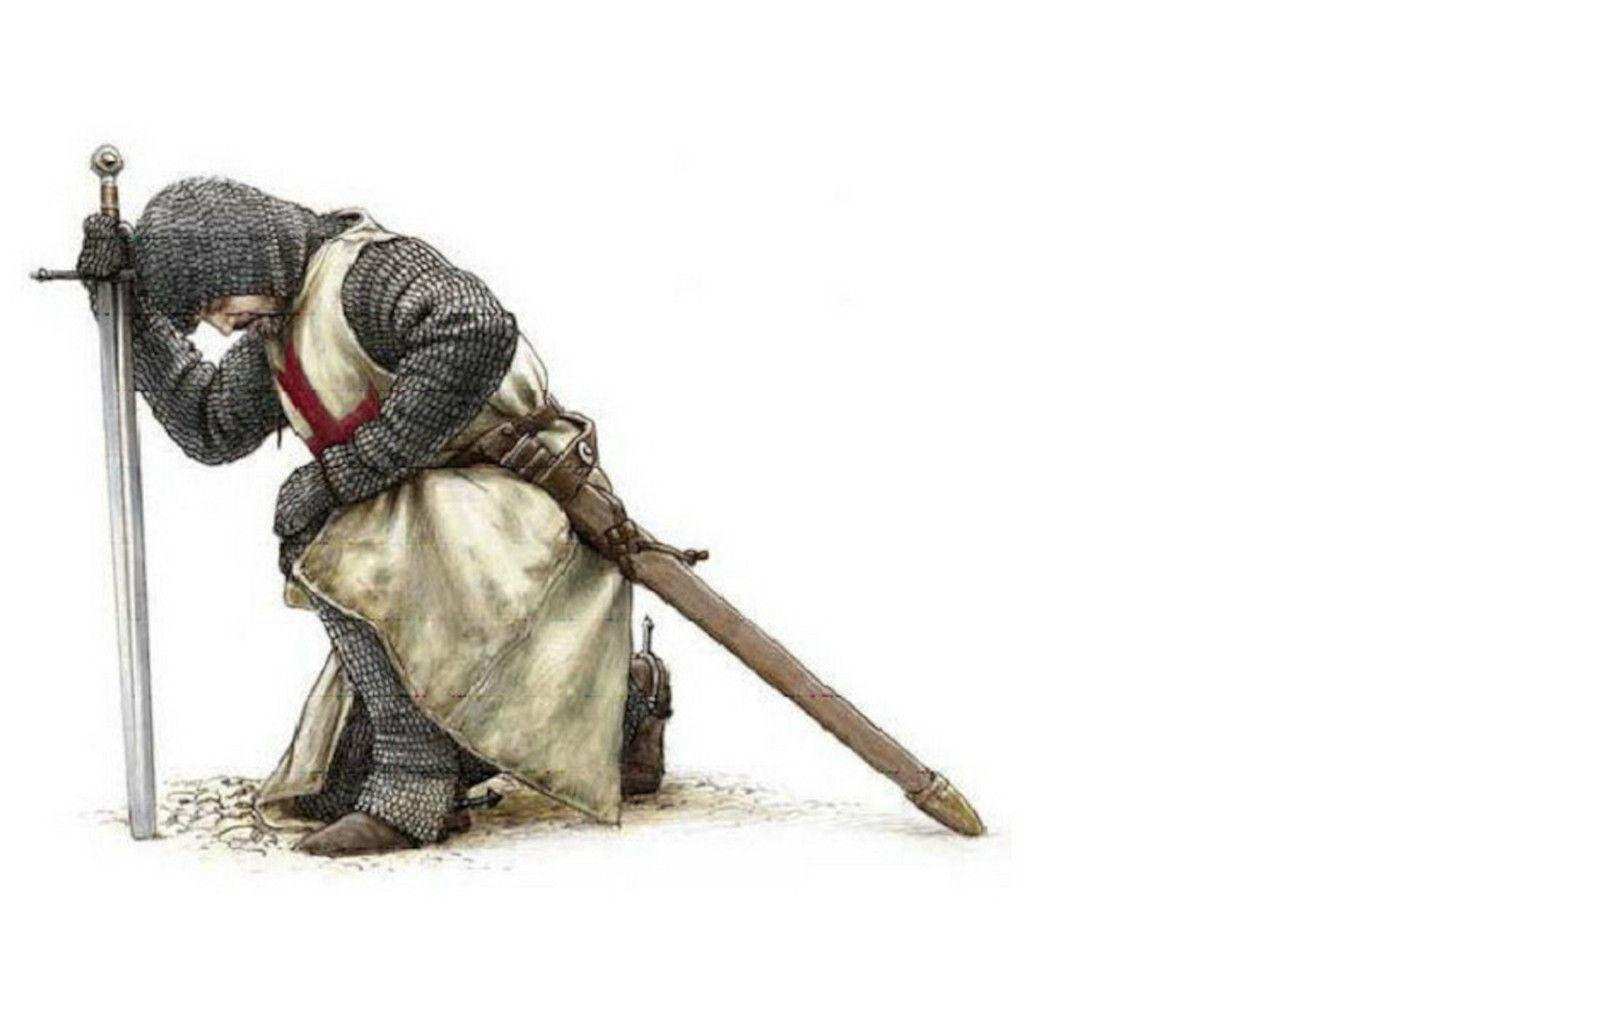 2020 Knights Templar Kneeling At His Sword Art Silk Print Poster 24x36inch60x90cm 088 From Chuy8988 10 38 Dhgate Com